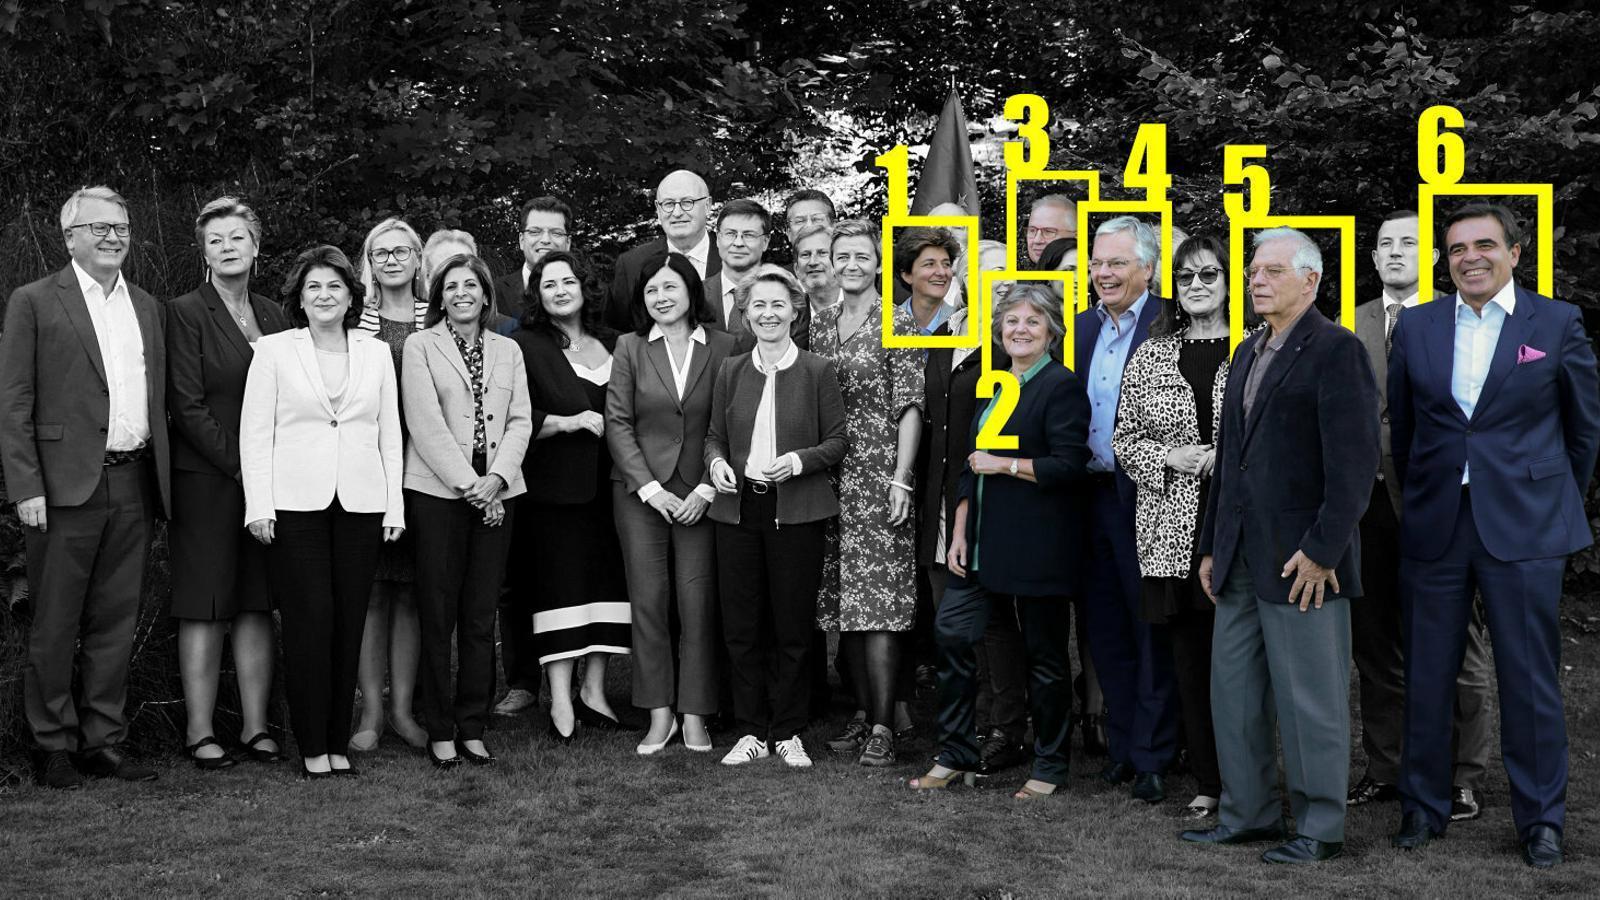 Candidats a governar la UE, sota la lupa